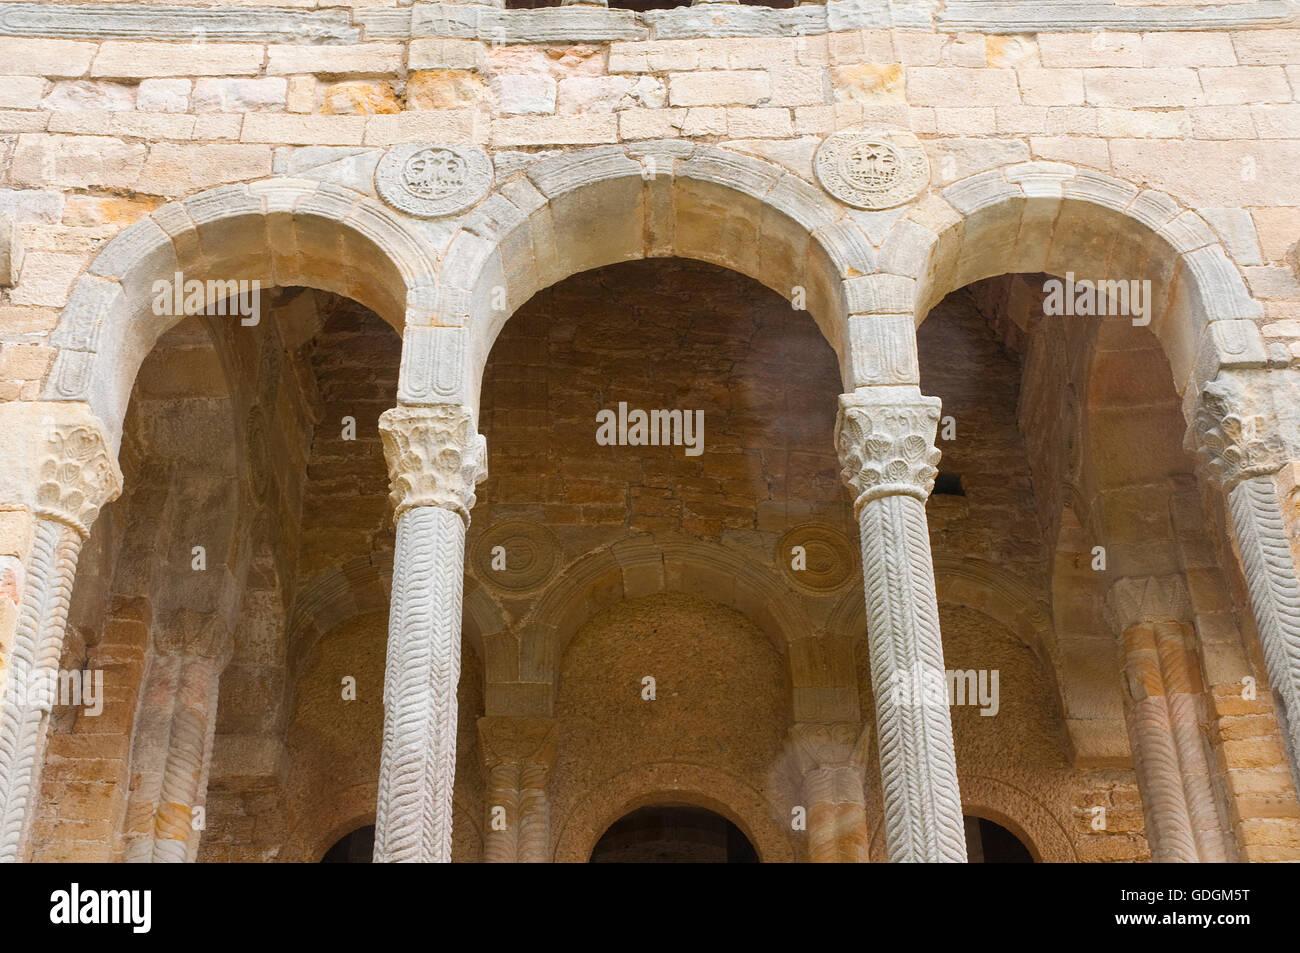 Arches, Santa Maria del Naranco church. Oviedo, Asturias, Spain. - Stock Image